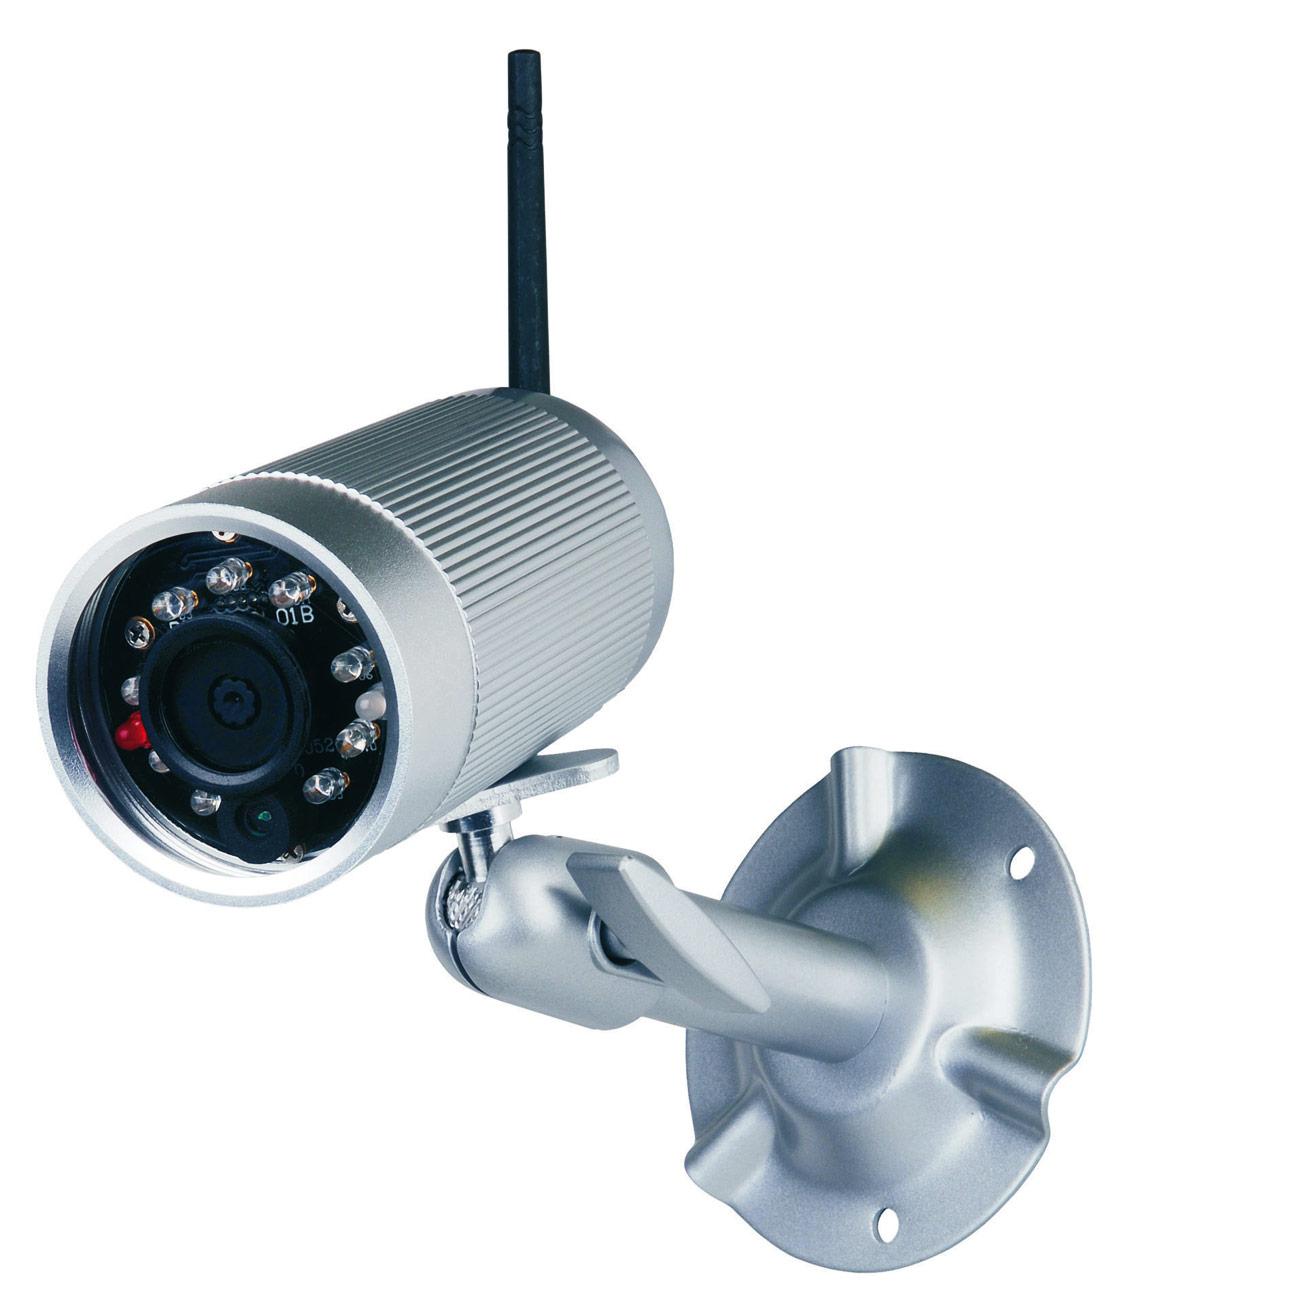 kabelloses berwachungskamera system kabelloses berwachungskamera system g nstig kaufen im. Black Bedroom Furniture Sets. Home Design Ideas